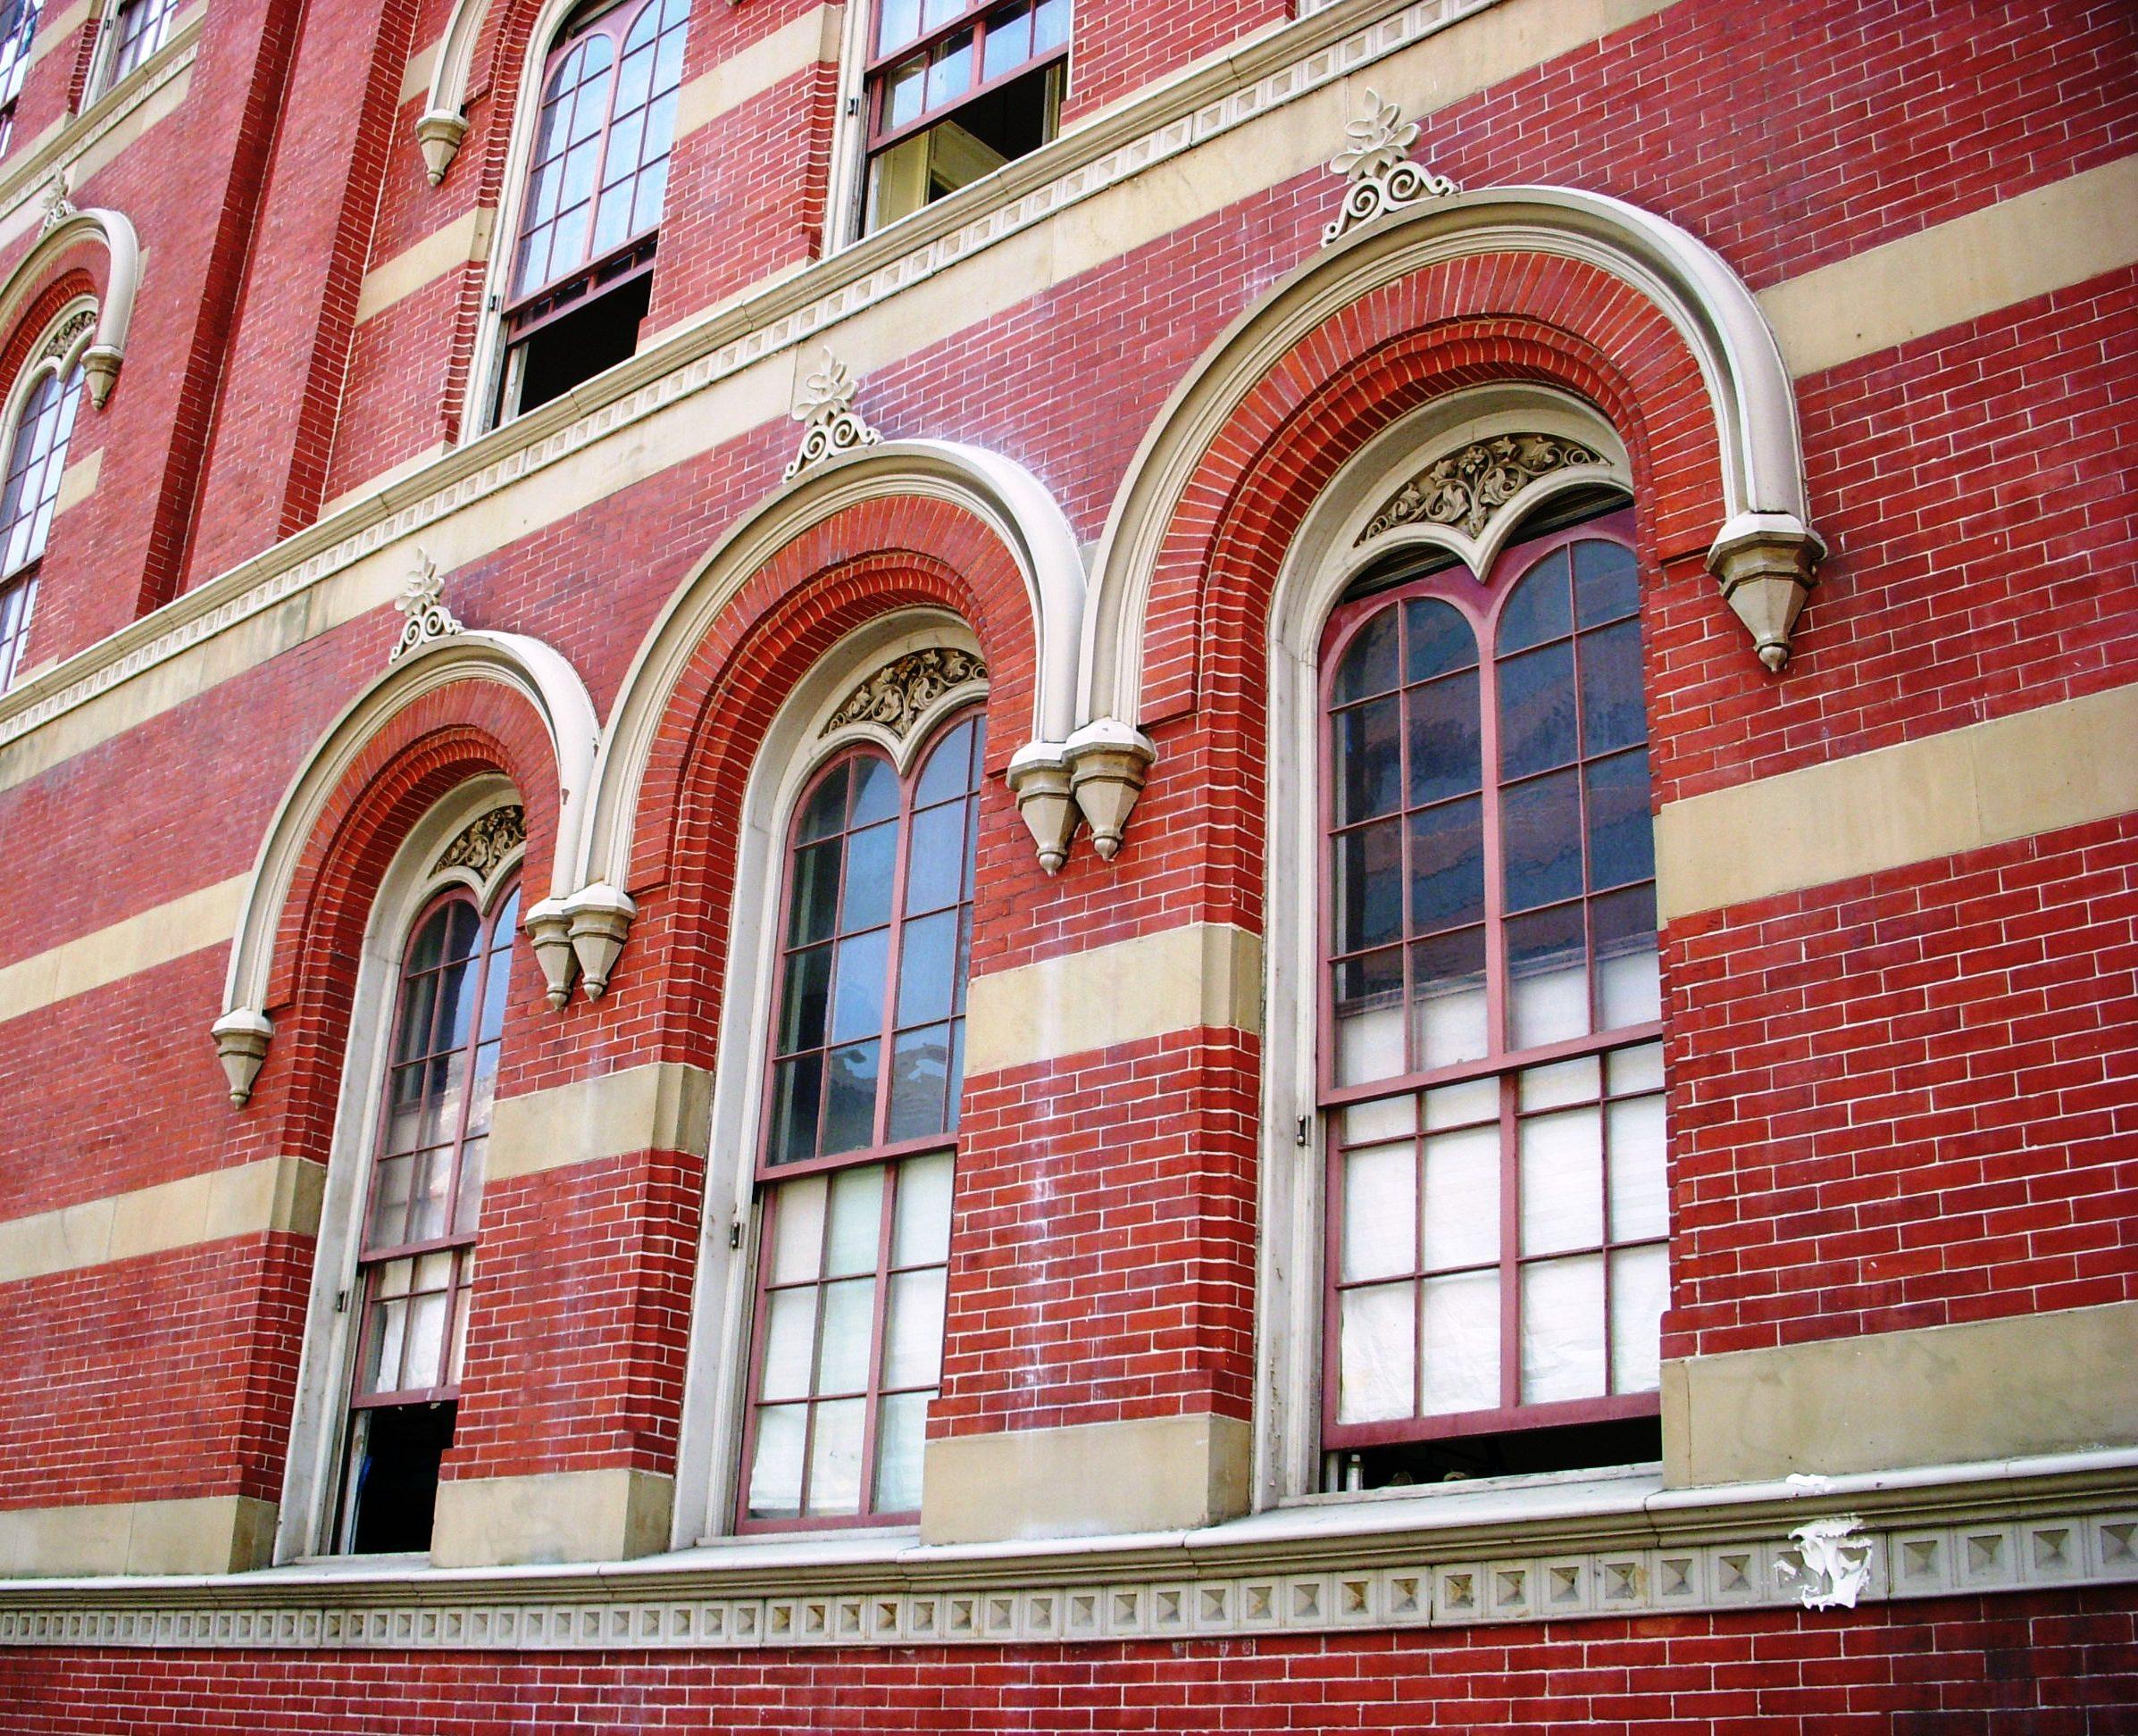 Museum Studies hardest college subjects reddit